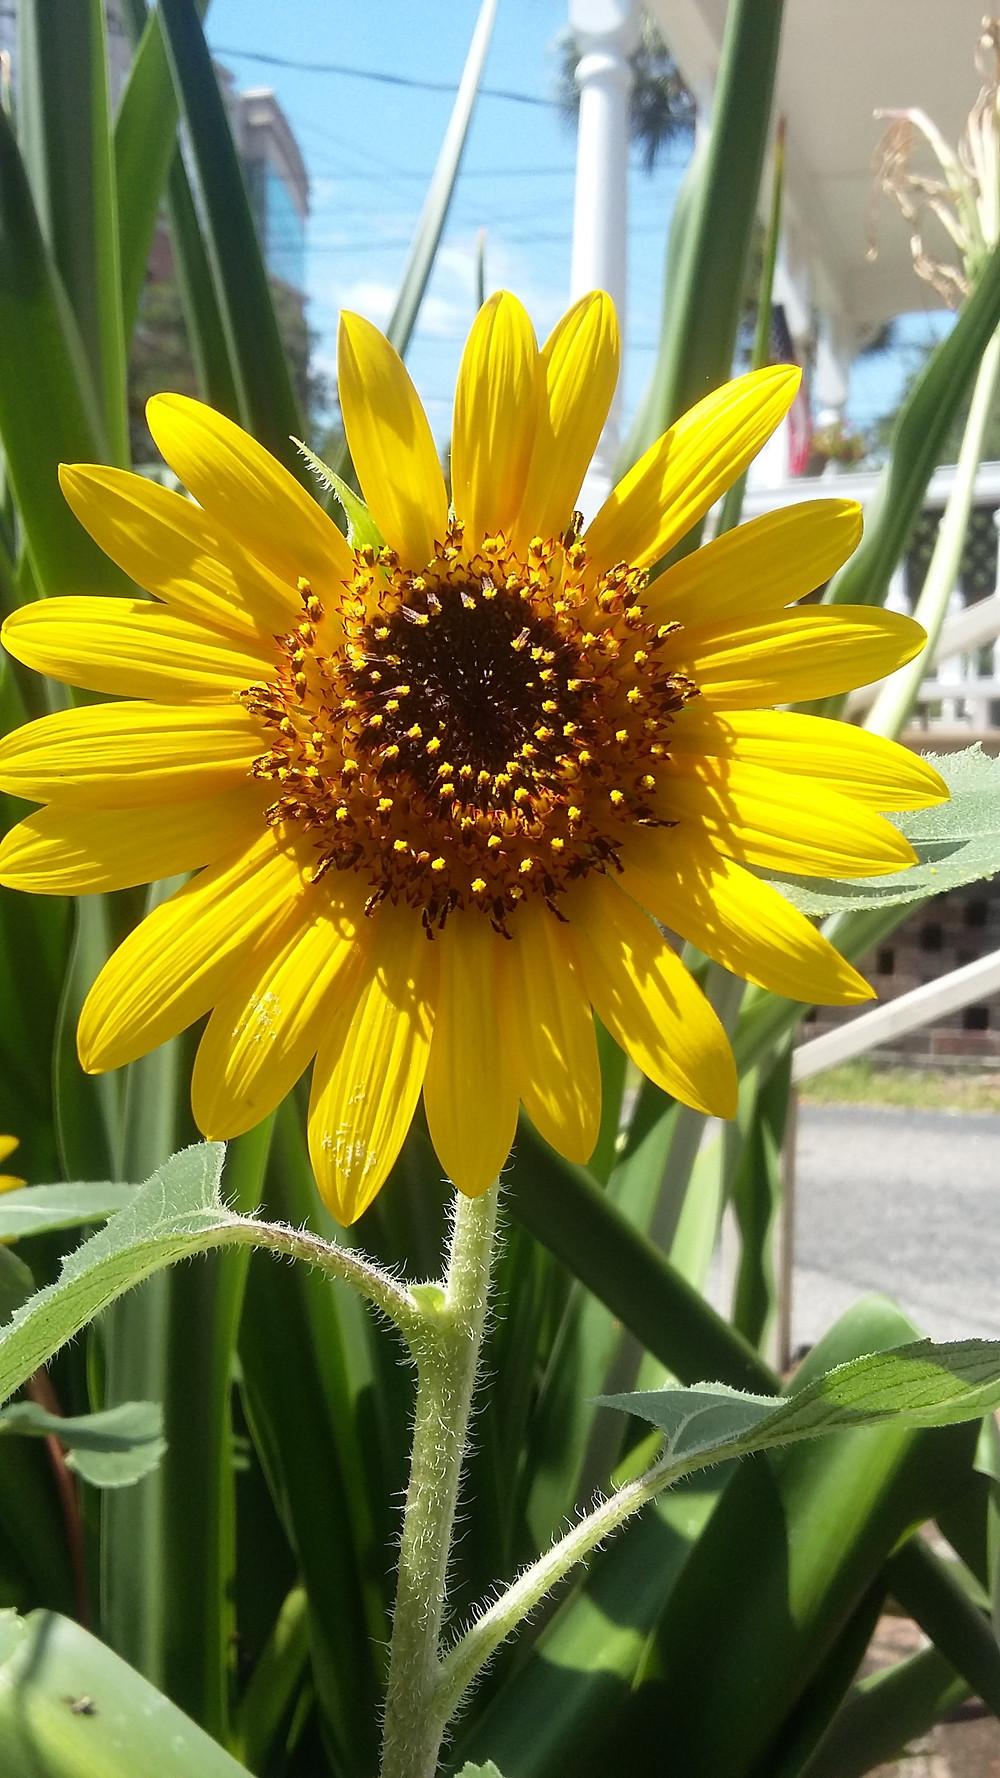 Love My Sunny flowers !!!